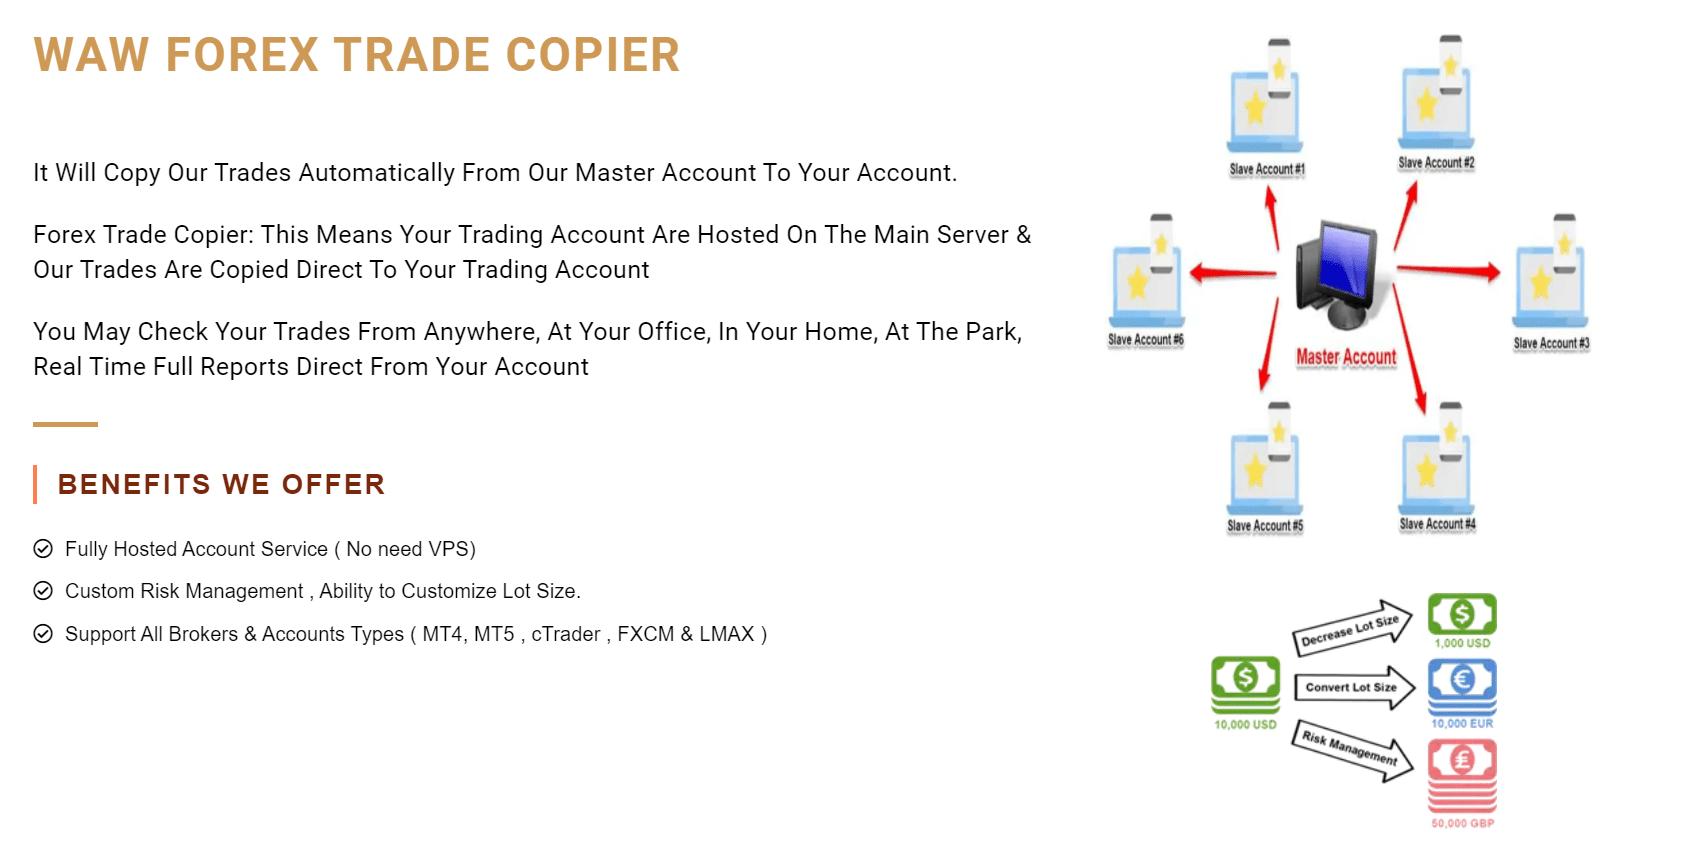 Waw Forex trade copier